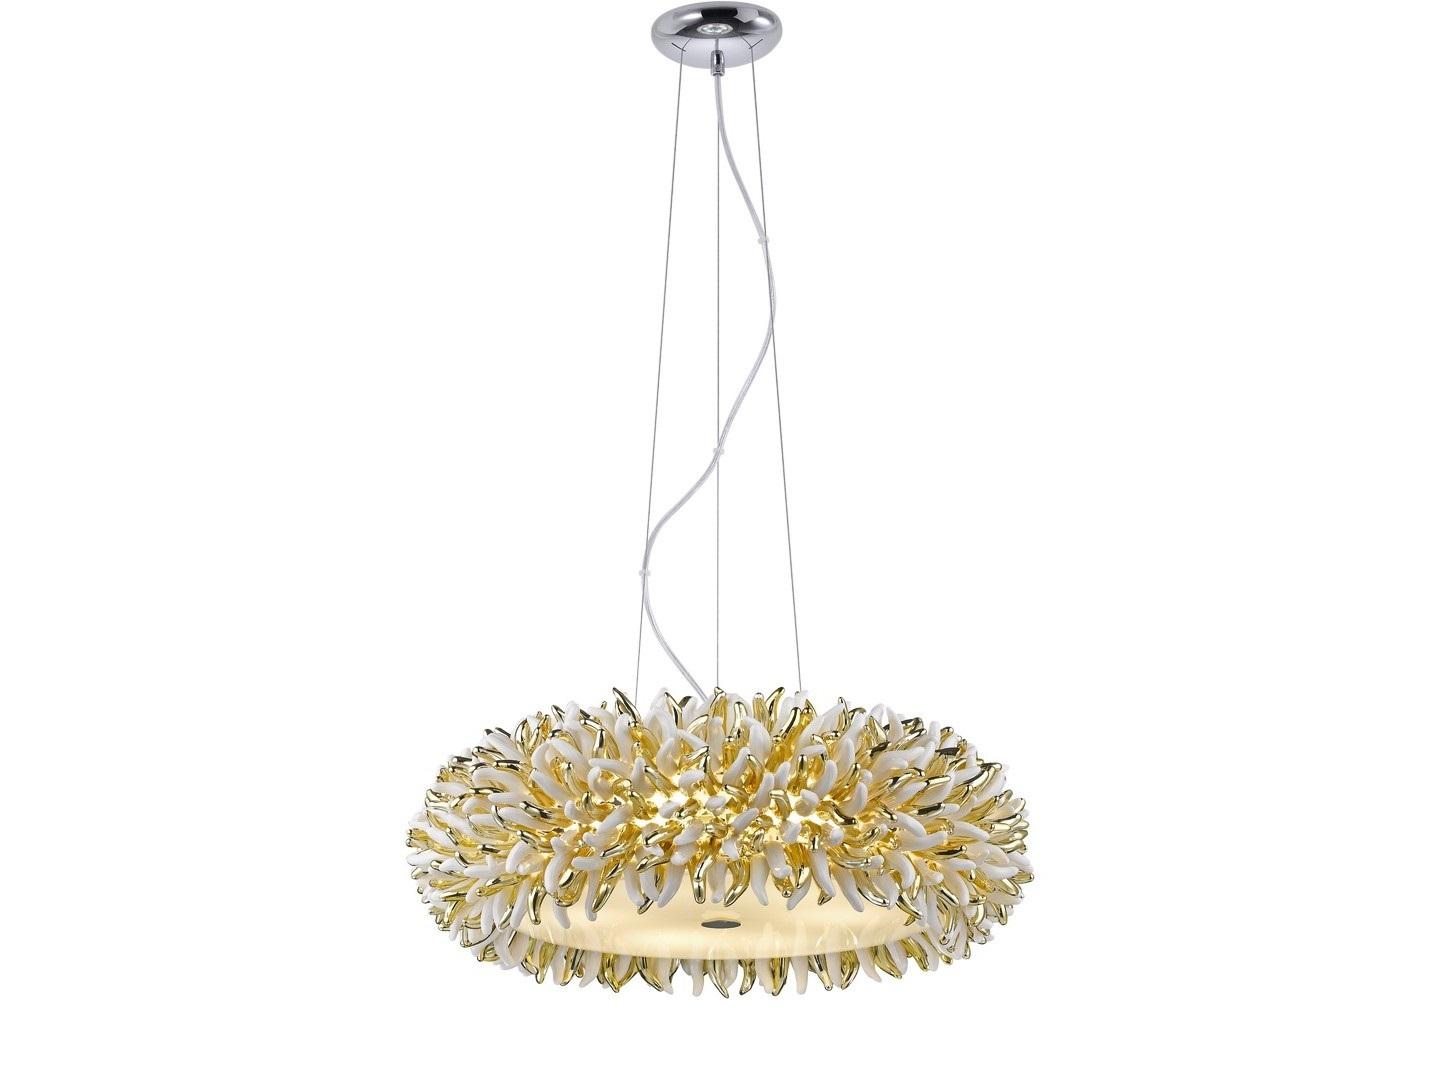 Подвесной светильникПодвесные светильники<br>Тип цоколя: E27&amp;nbsp;Мощность лампы: 20WКоличество ламп: 6<br><br>kit: None<br>gender: None